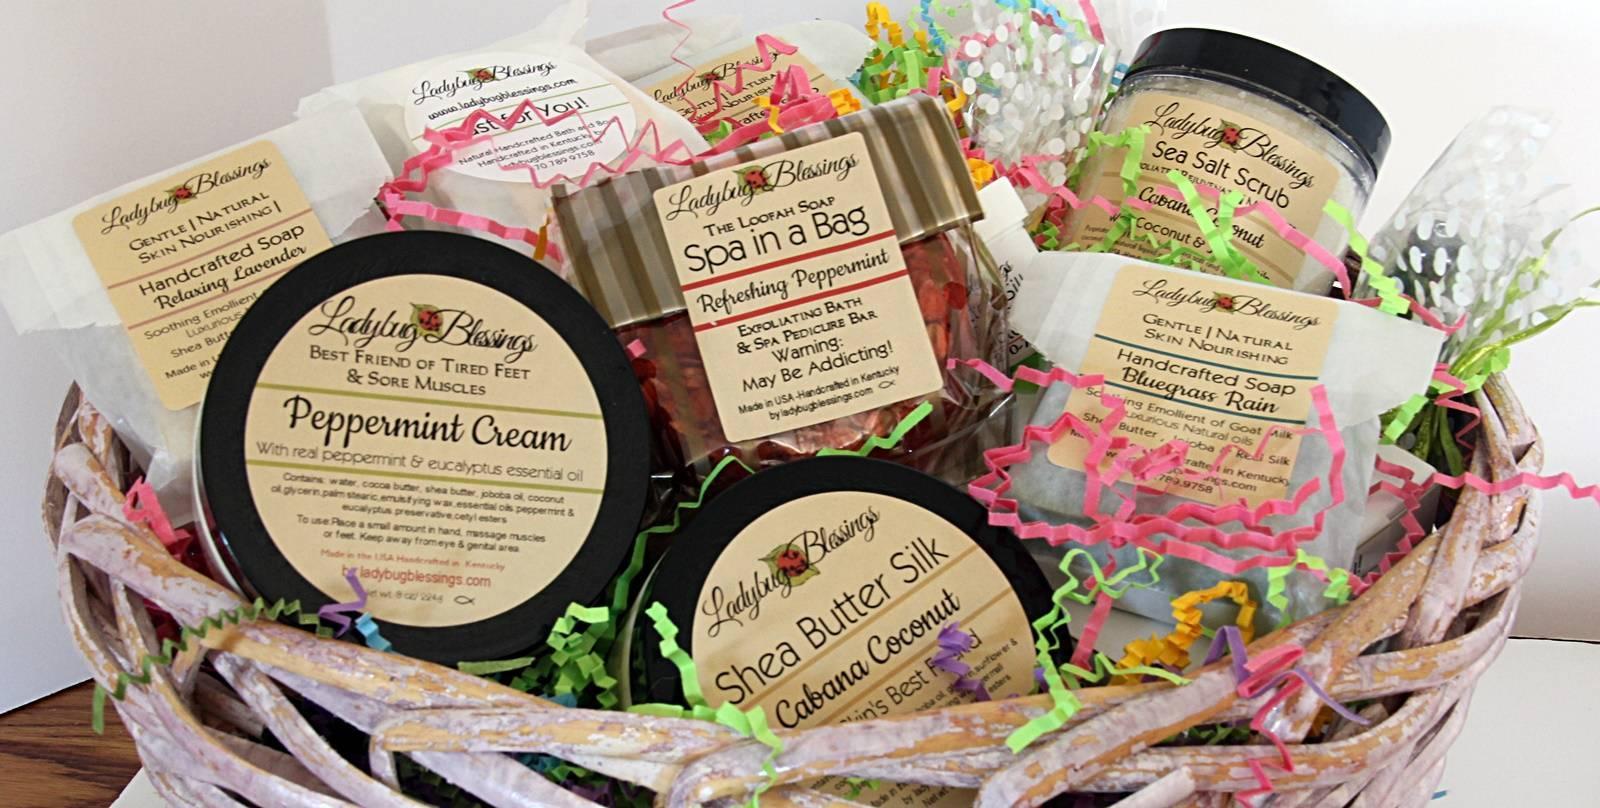 Customized gift Baskets, customized gift basket for every occasion. Customized bath gift basket